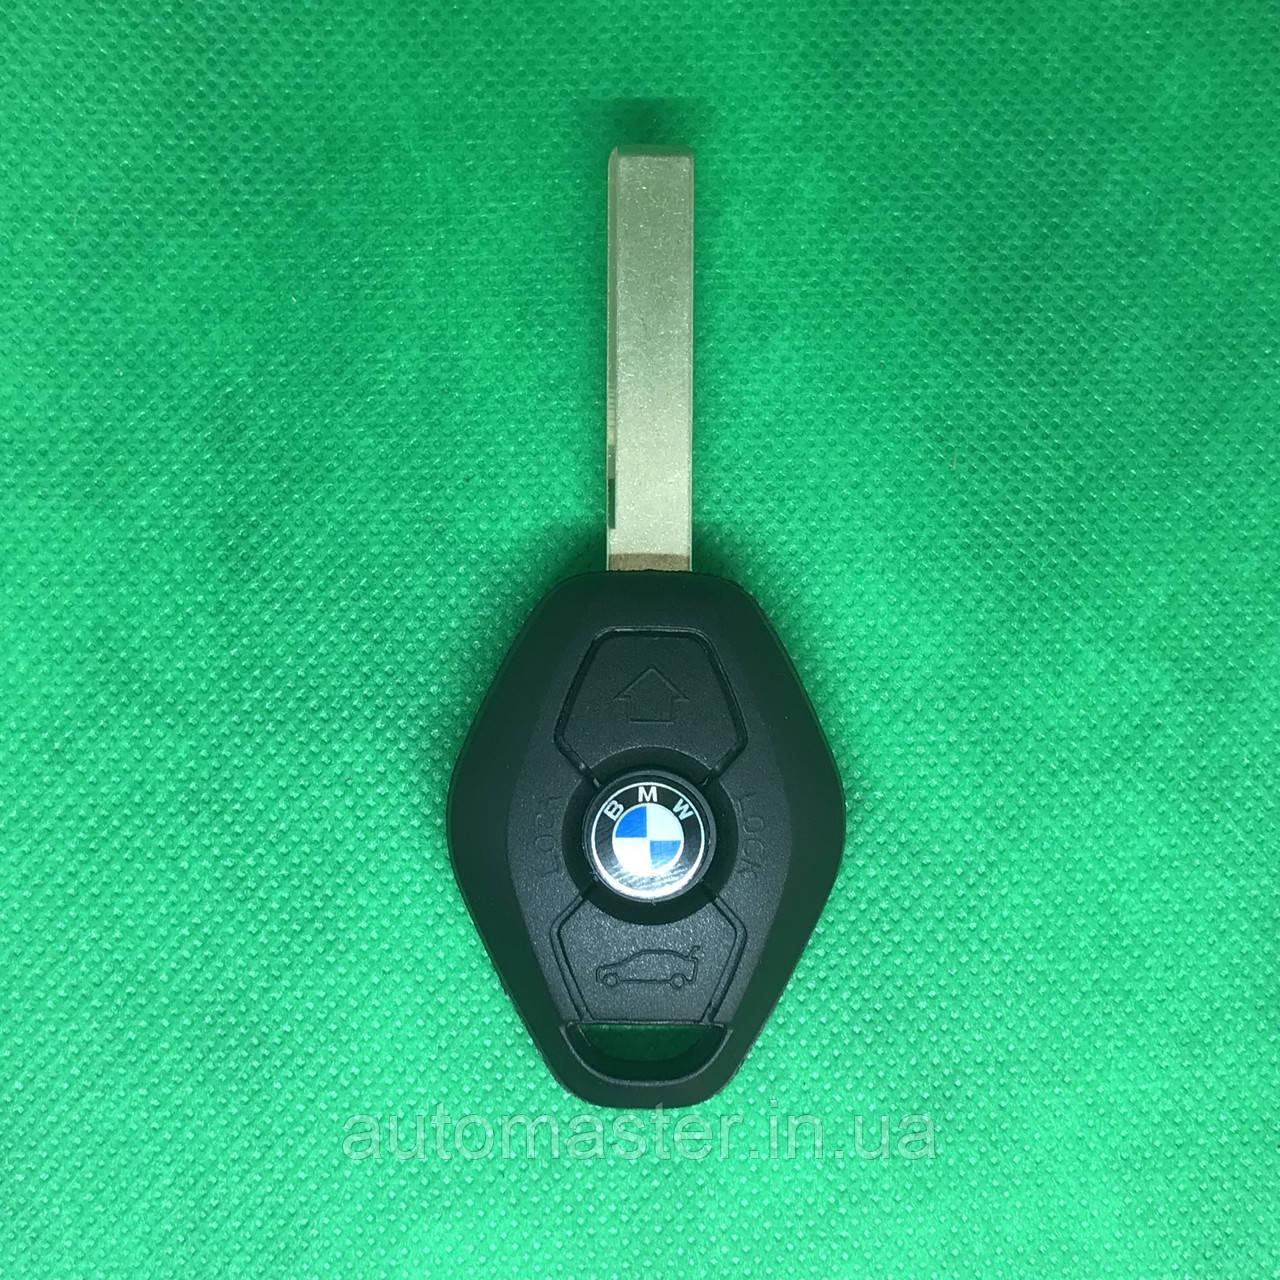 Корпус авто ключа под чип для BMW Е46, Е53, Е60, Х3, Х5 (бмв) лезвие HU 92